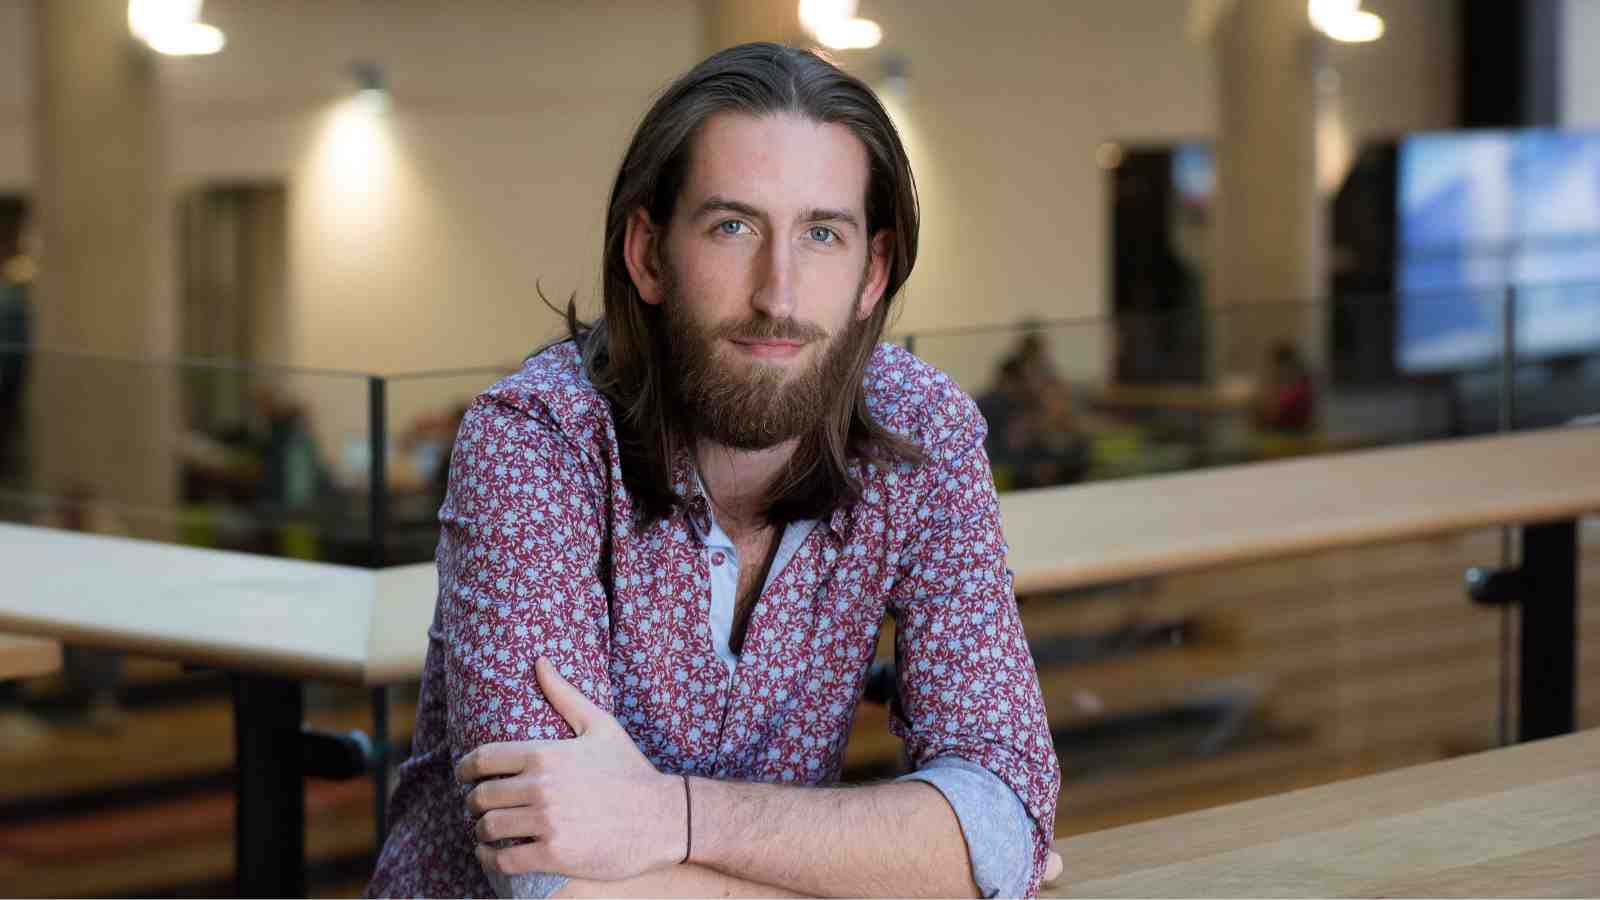 PhD candidate Christopher Maymon